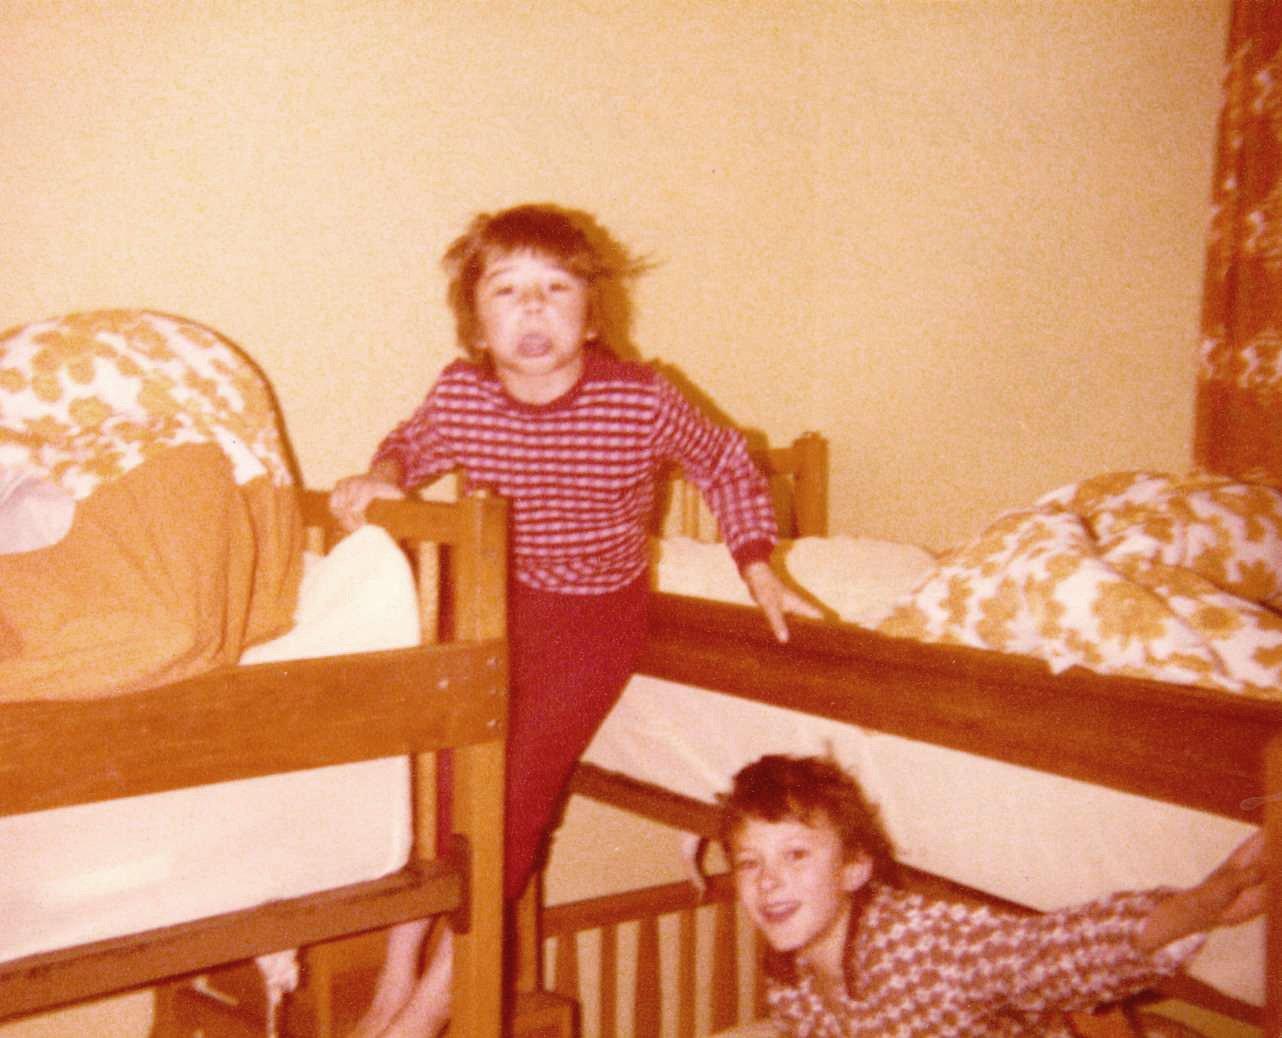 c. 1980 Barnes Close. Simon Day and Simon Coombes.